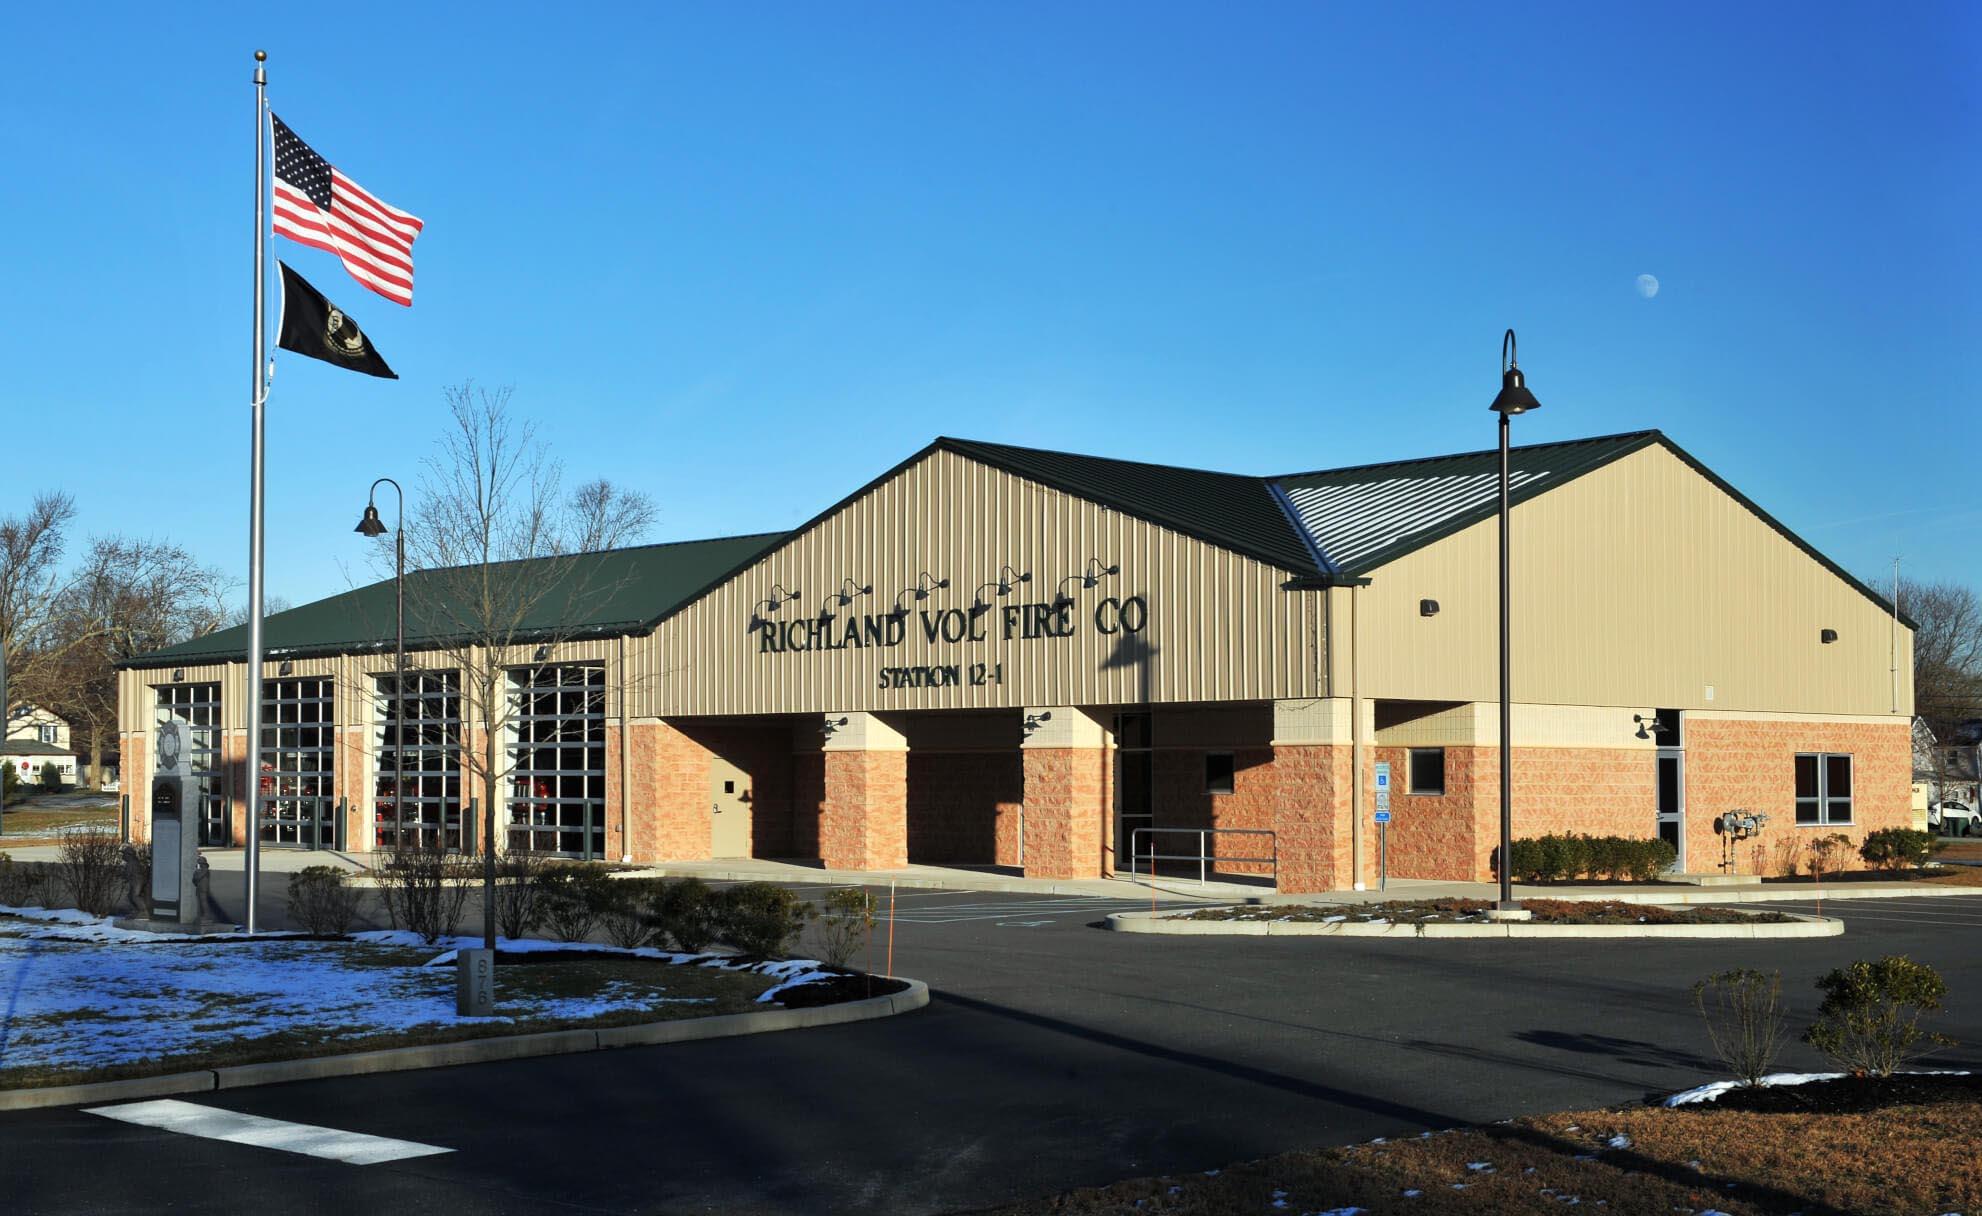 Richland Fire Company 12-1